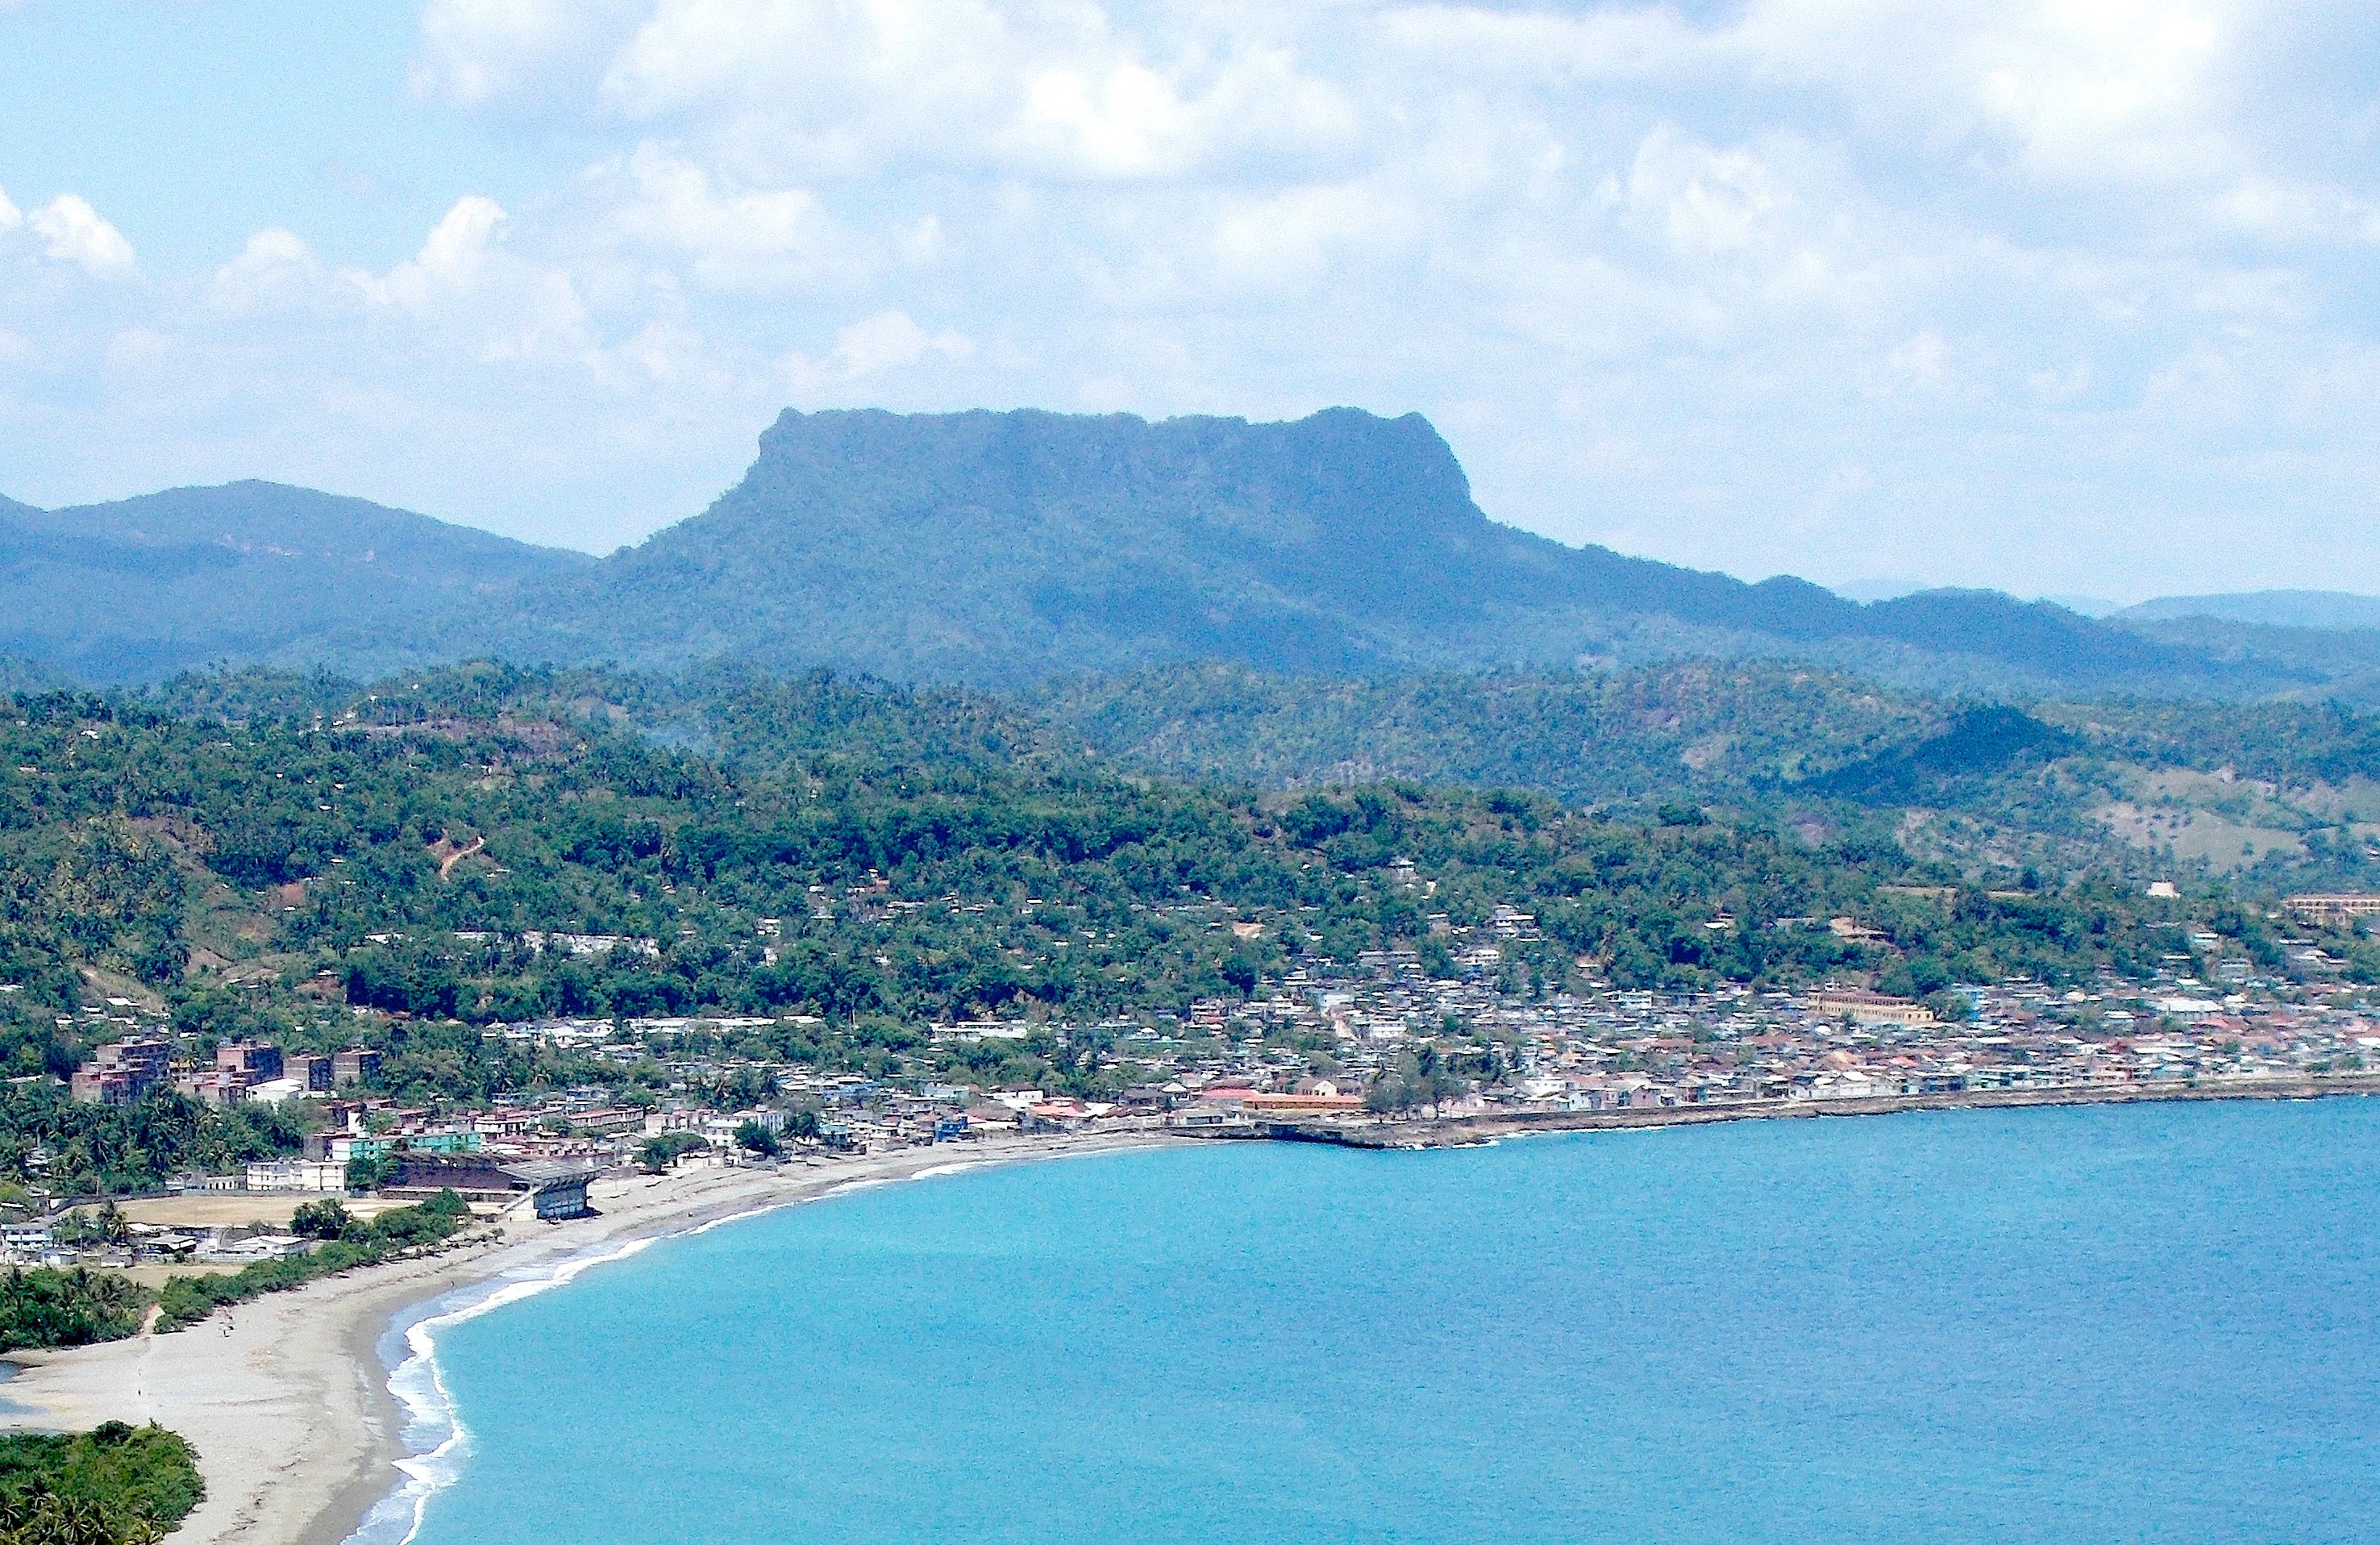 Baracoa in Cuba